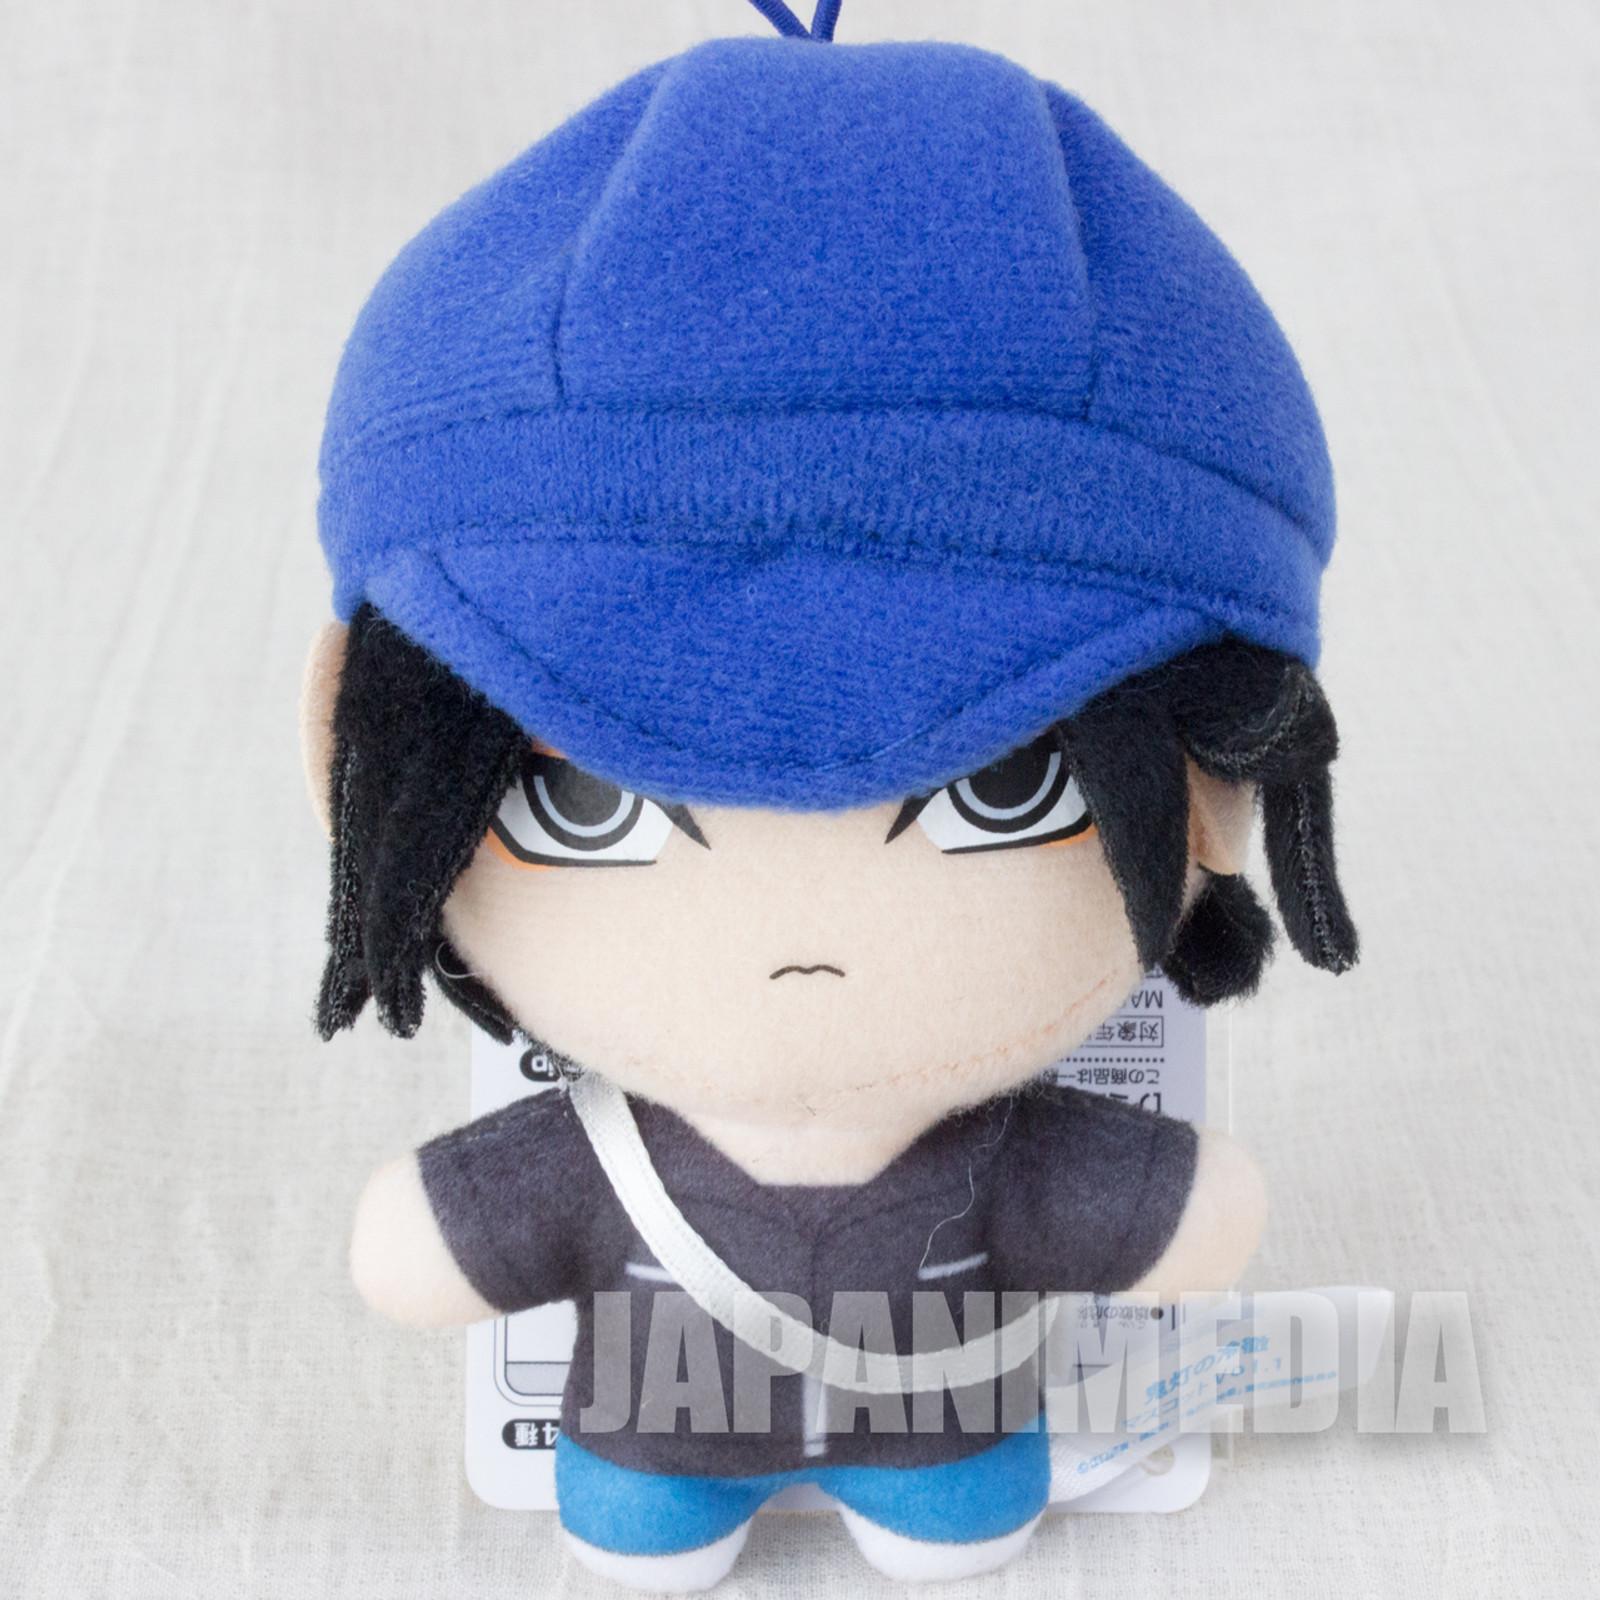 Hozuki no Reitetsu Hozuki Disguise Ver. Plush Doll JAPAN ANIME MANGA